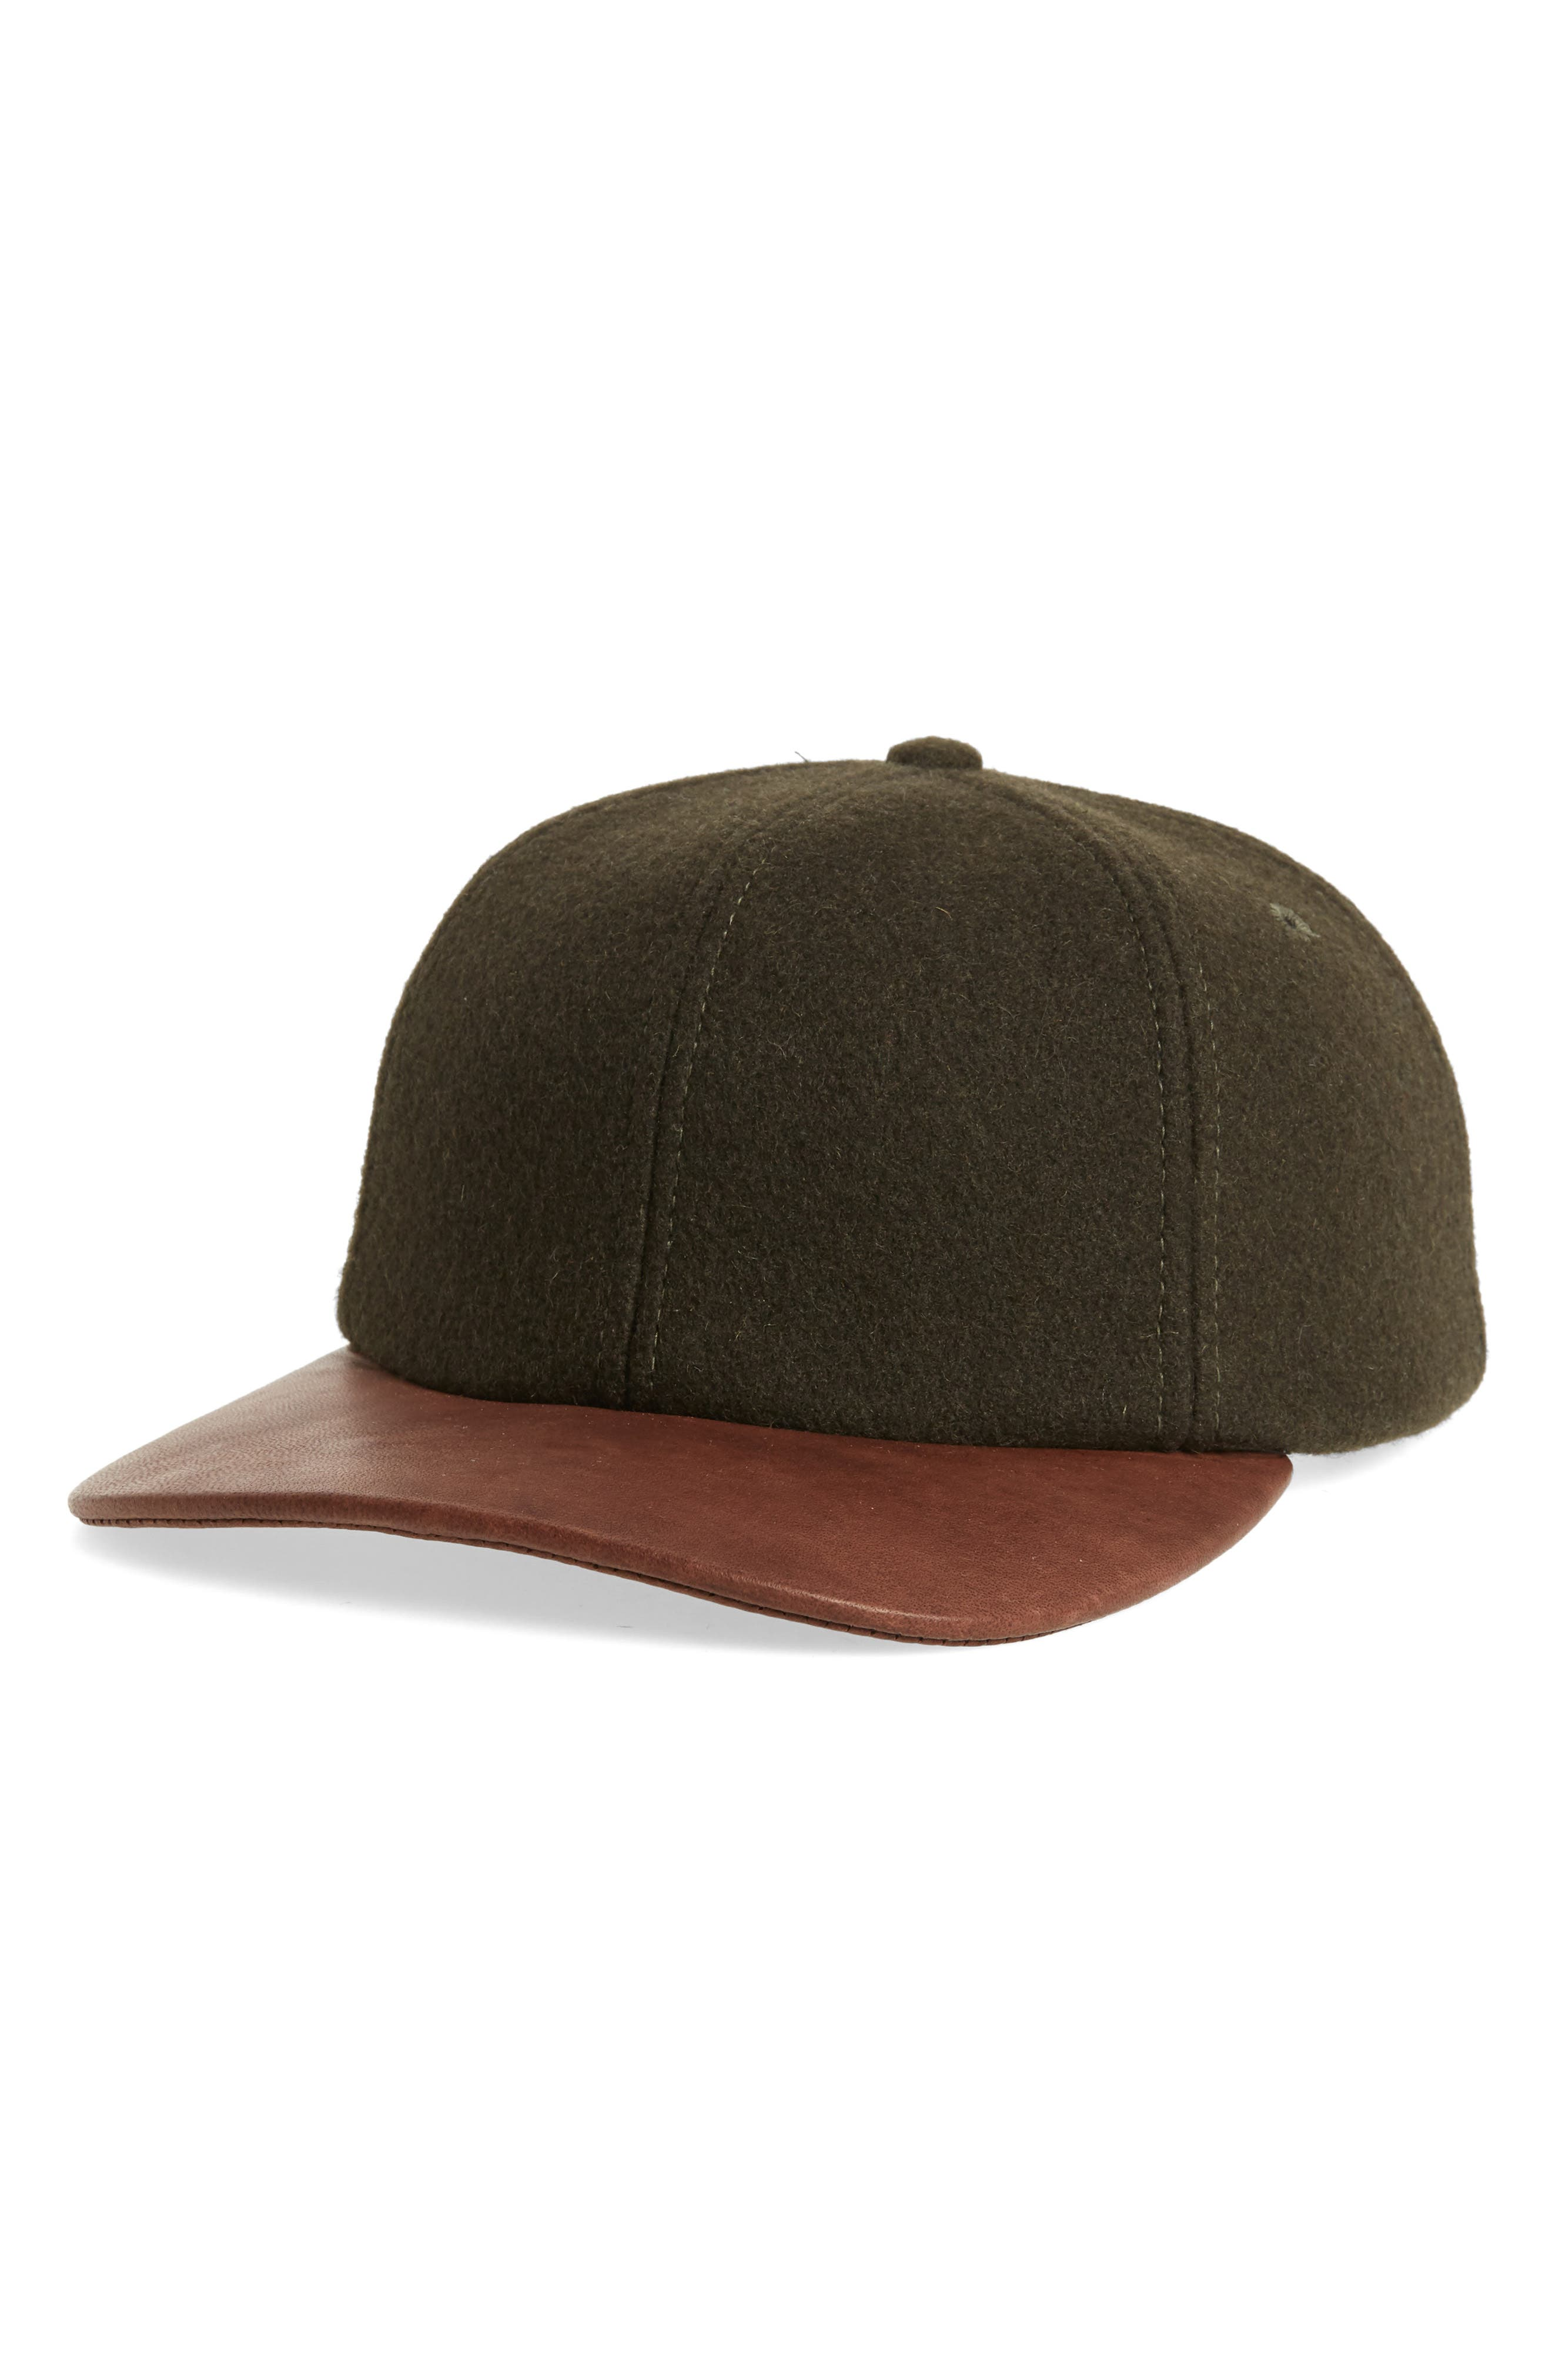 Melton Wool Blend Baseball Cap,                         Main,                         color, LODEN